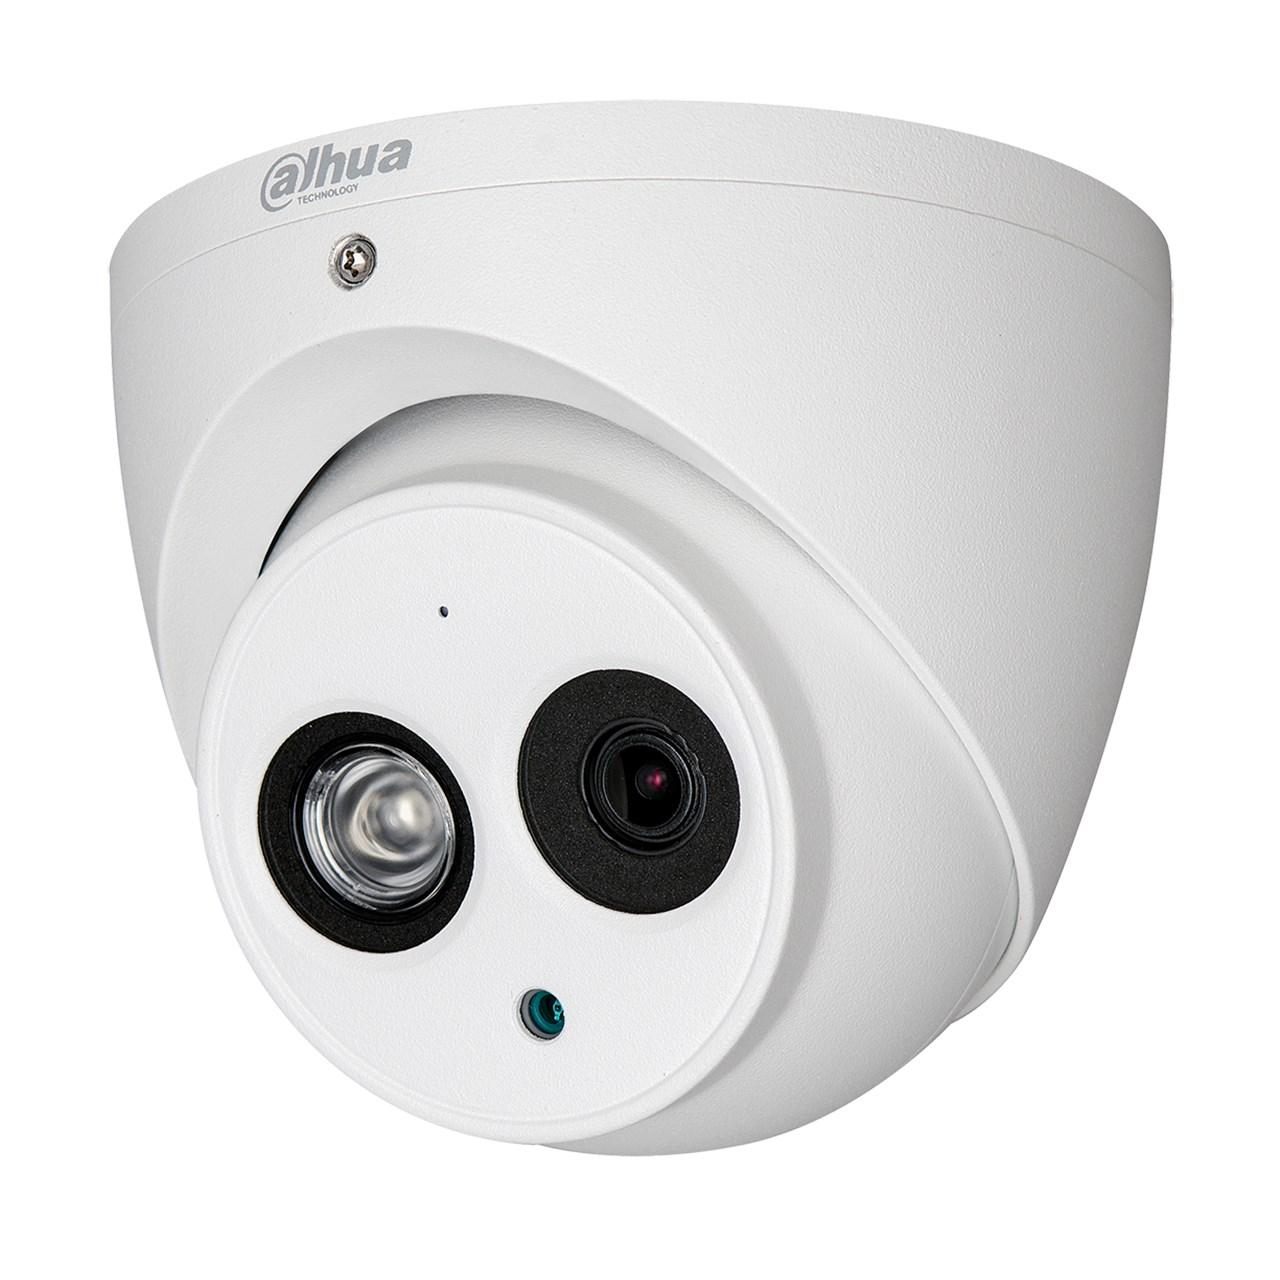 قیمت دوربین مداربسته دام داهوا مدل HDW1200EMPA